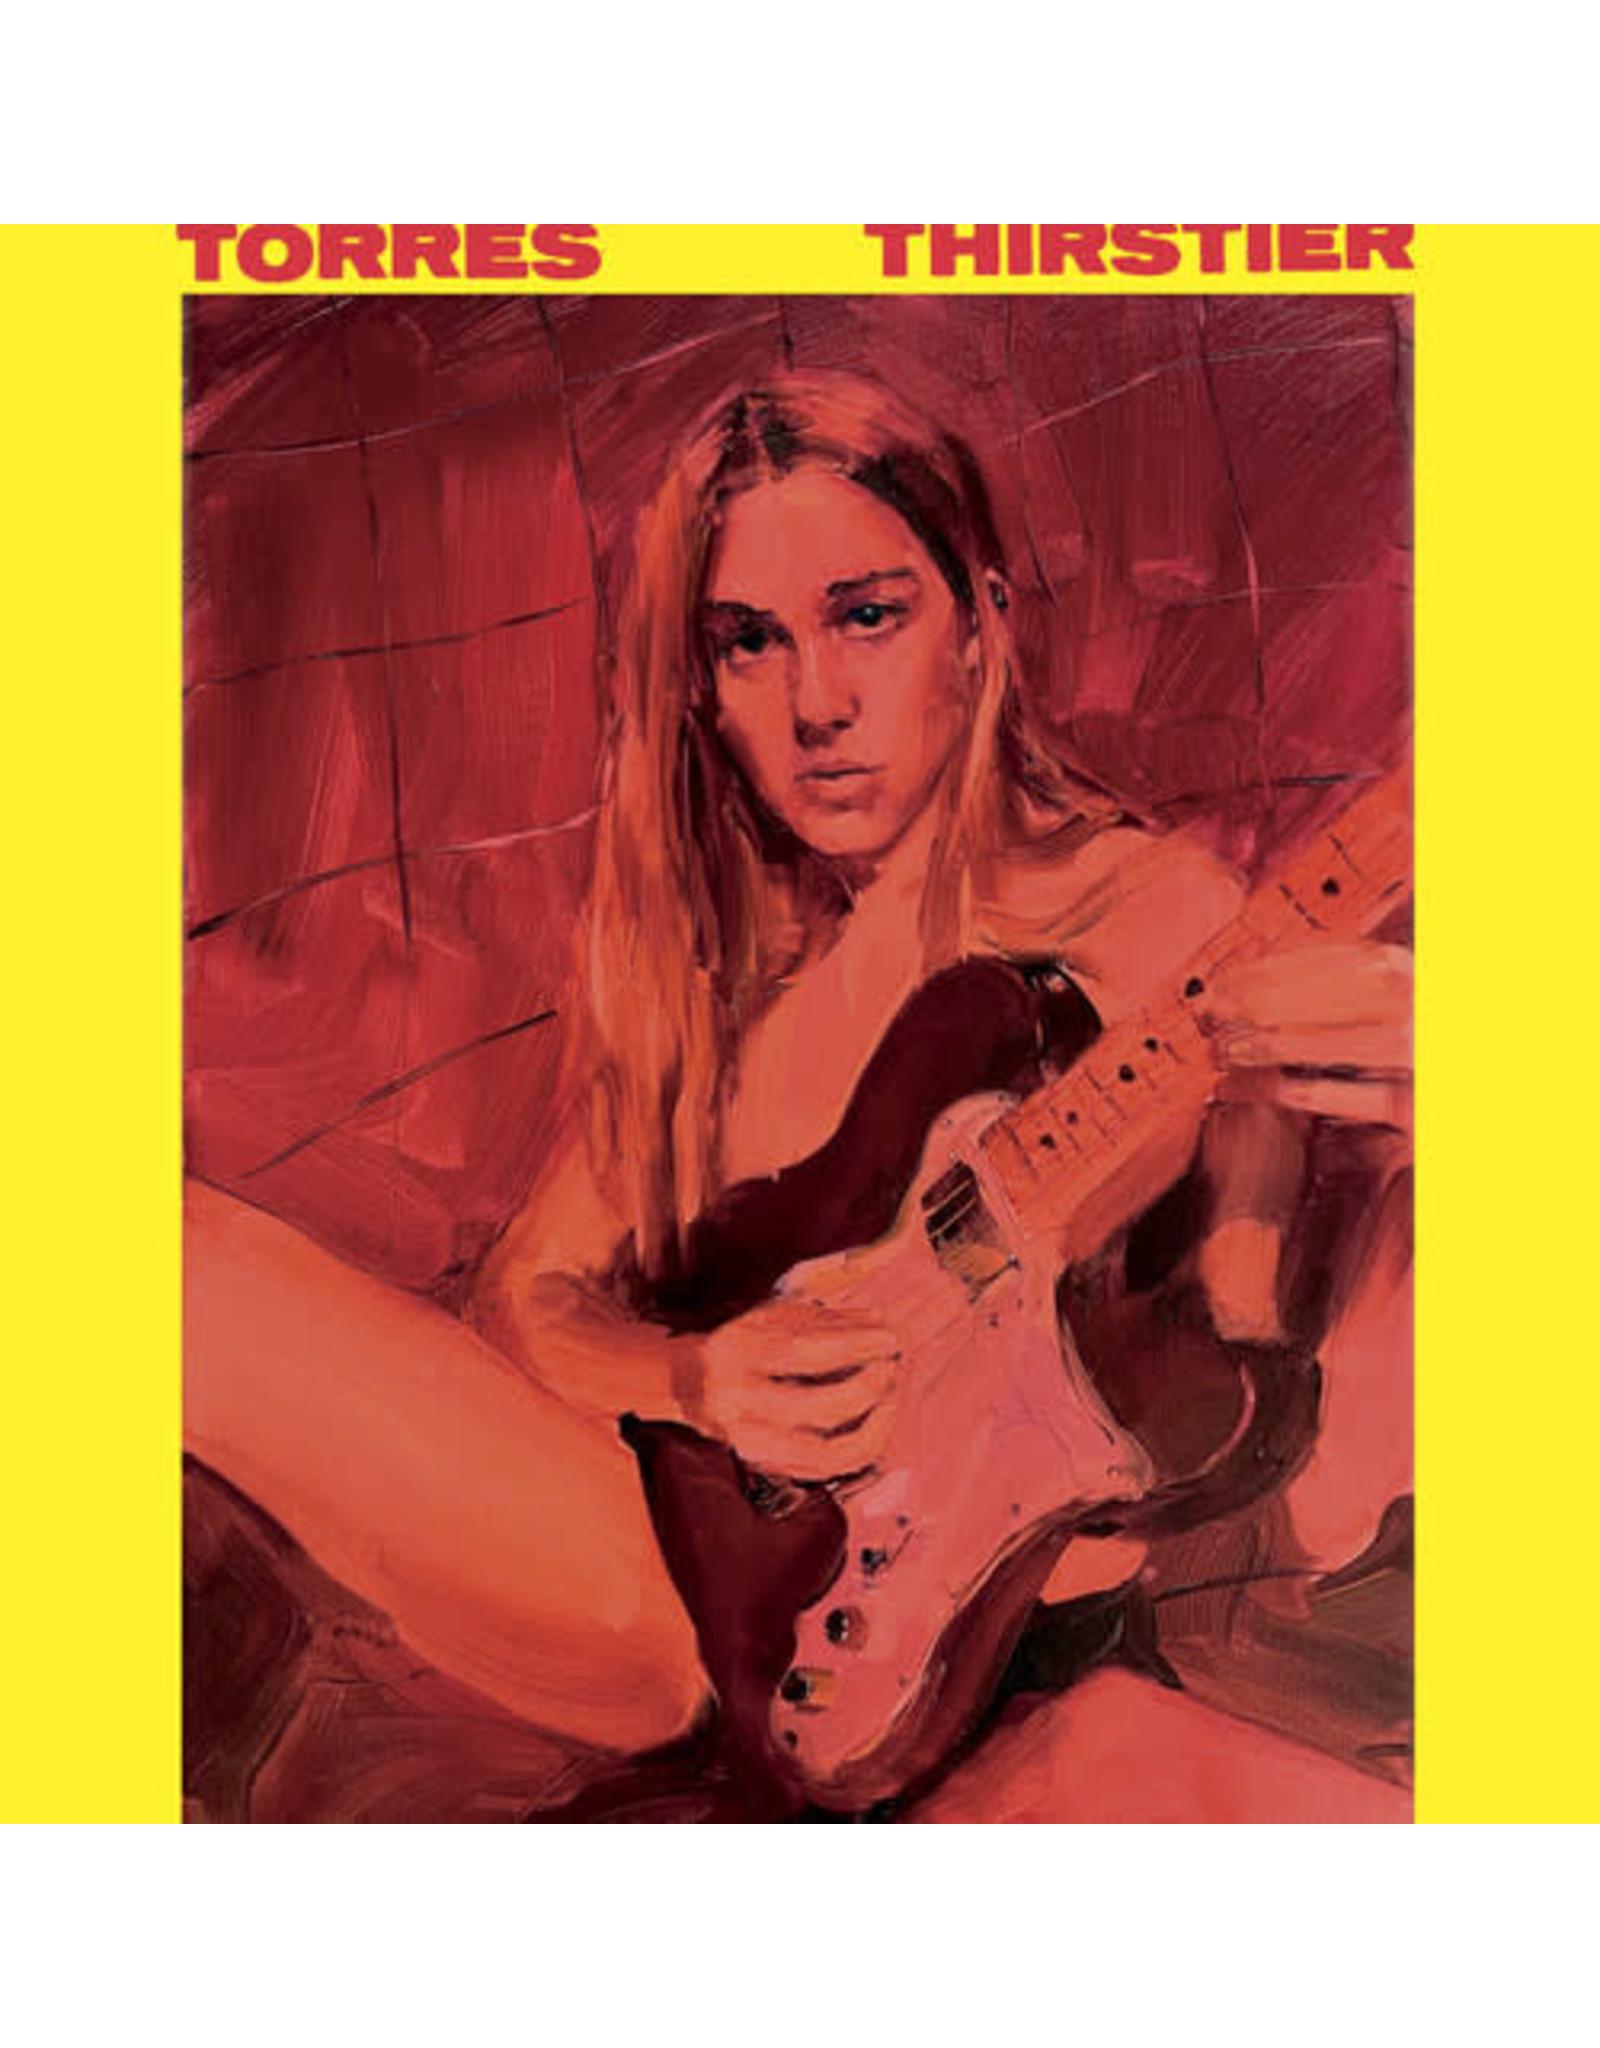 New Vinyl Torres - Thirstier LP